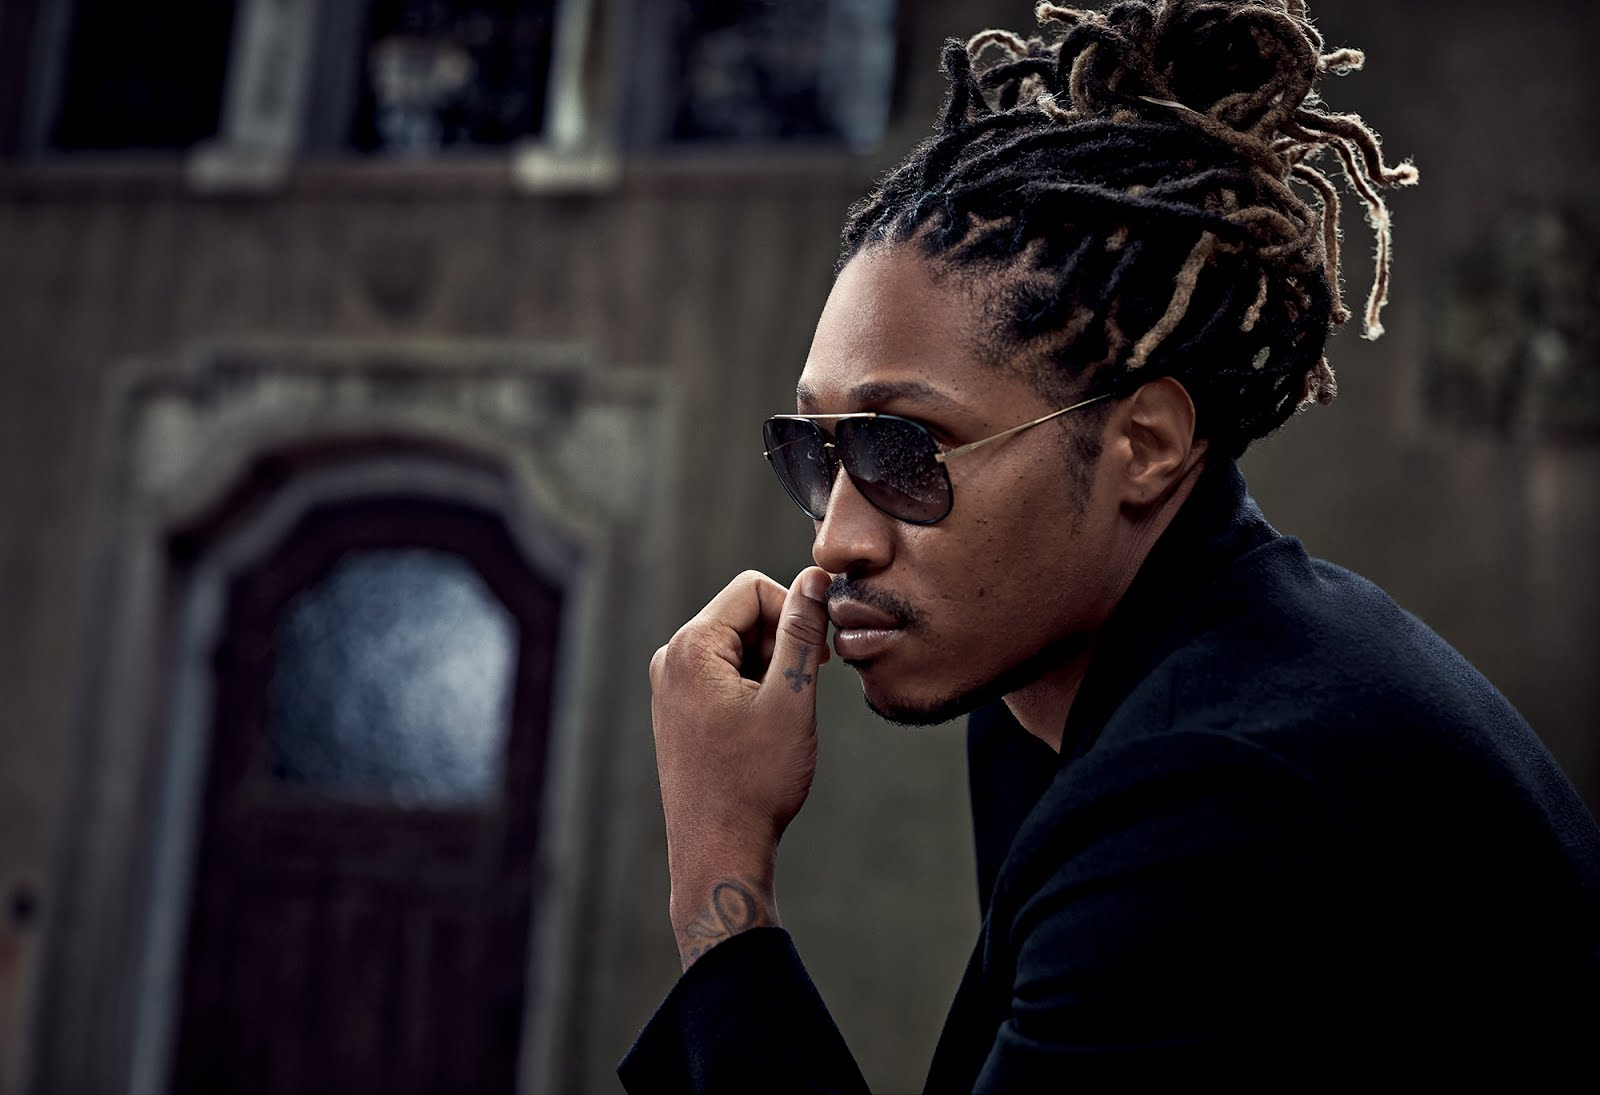 Professional rapper Nayvadius DeMun Wilburn aka Future